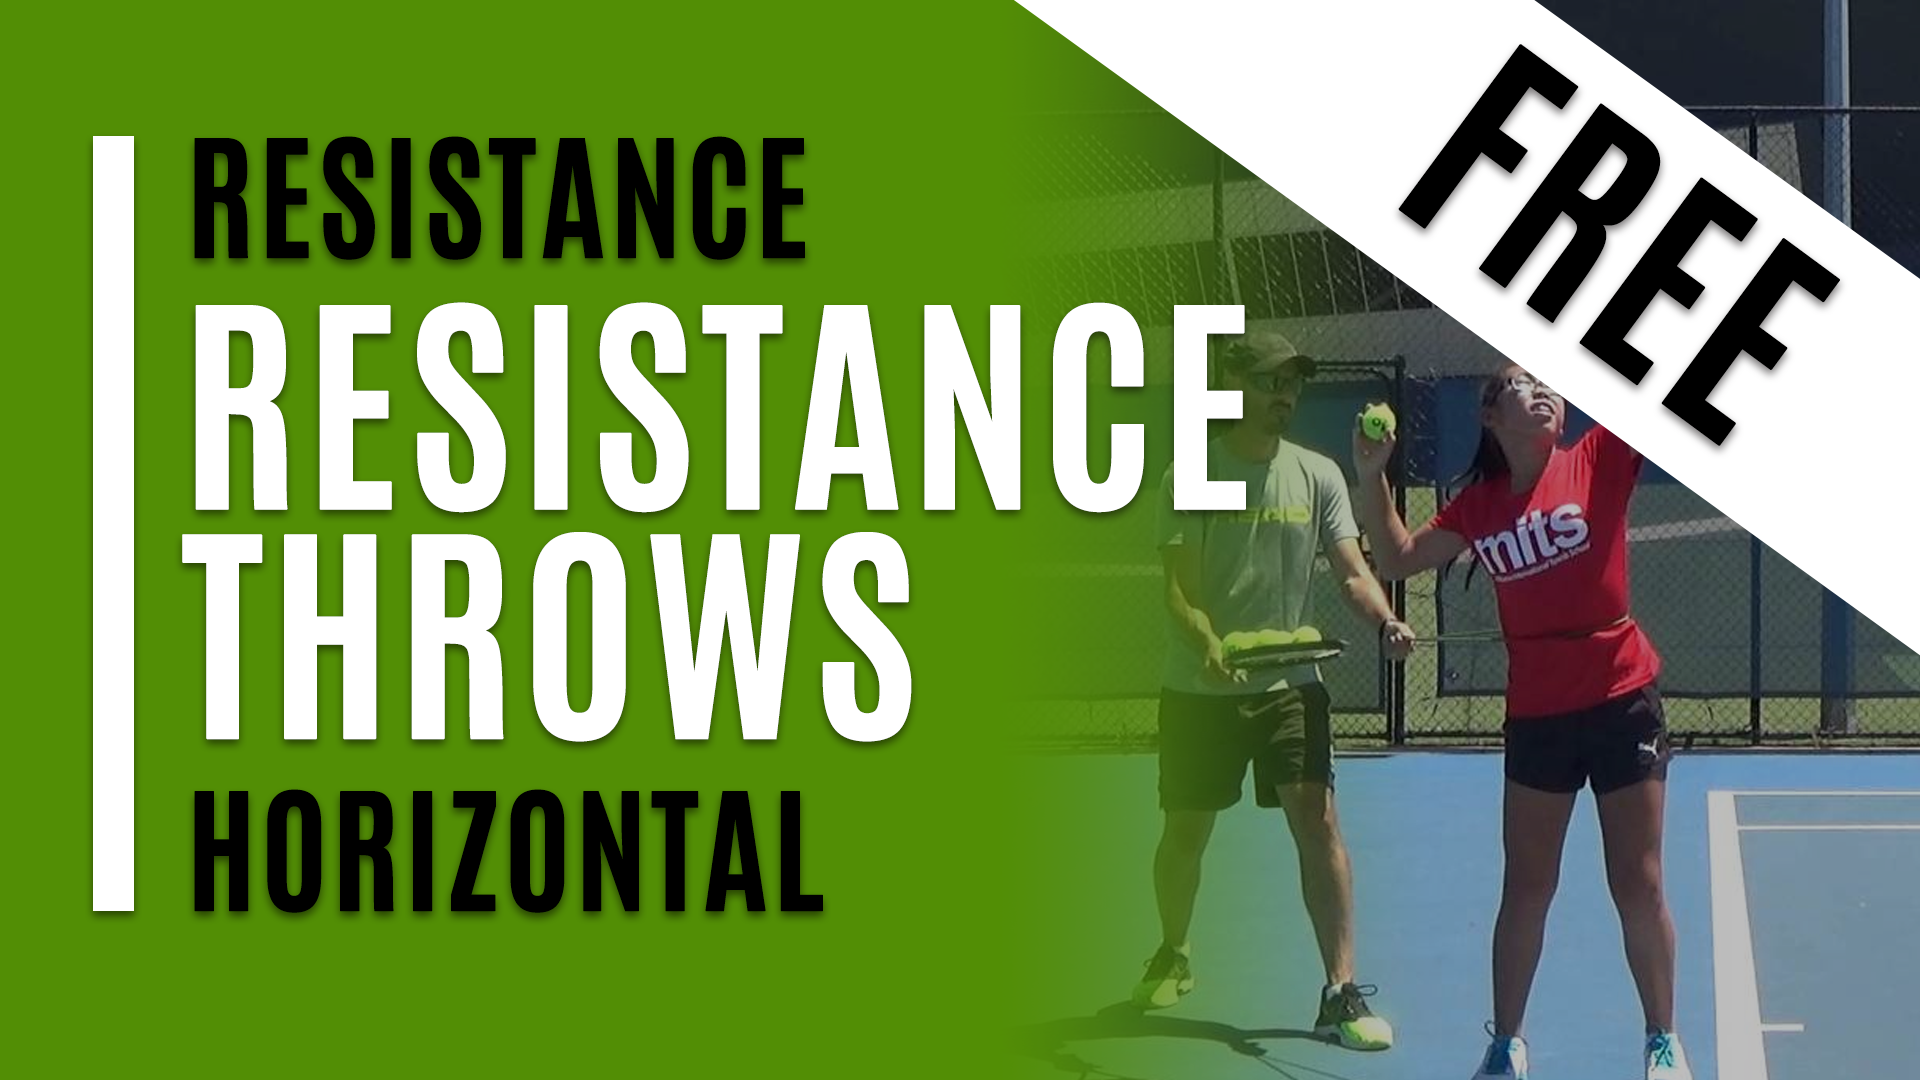 Resistance Throws - Horizontal